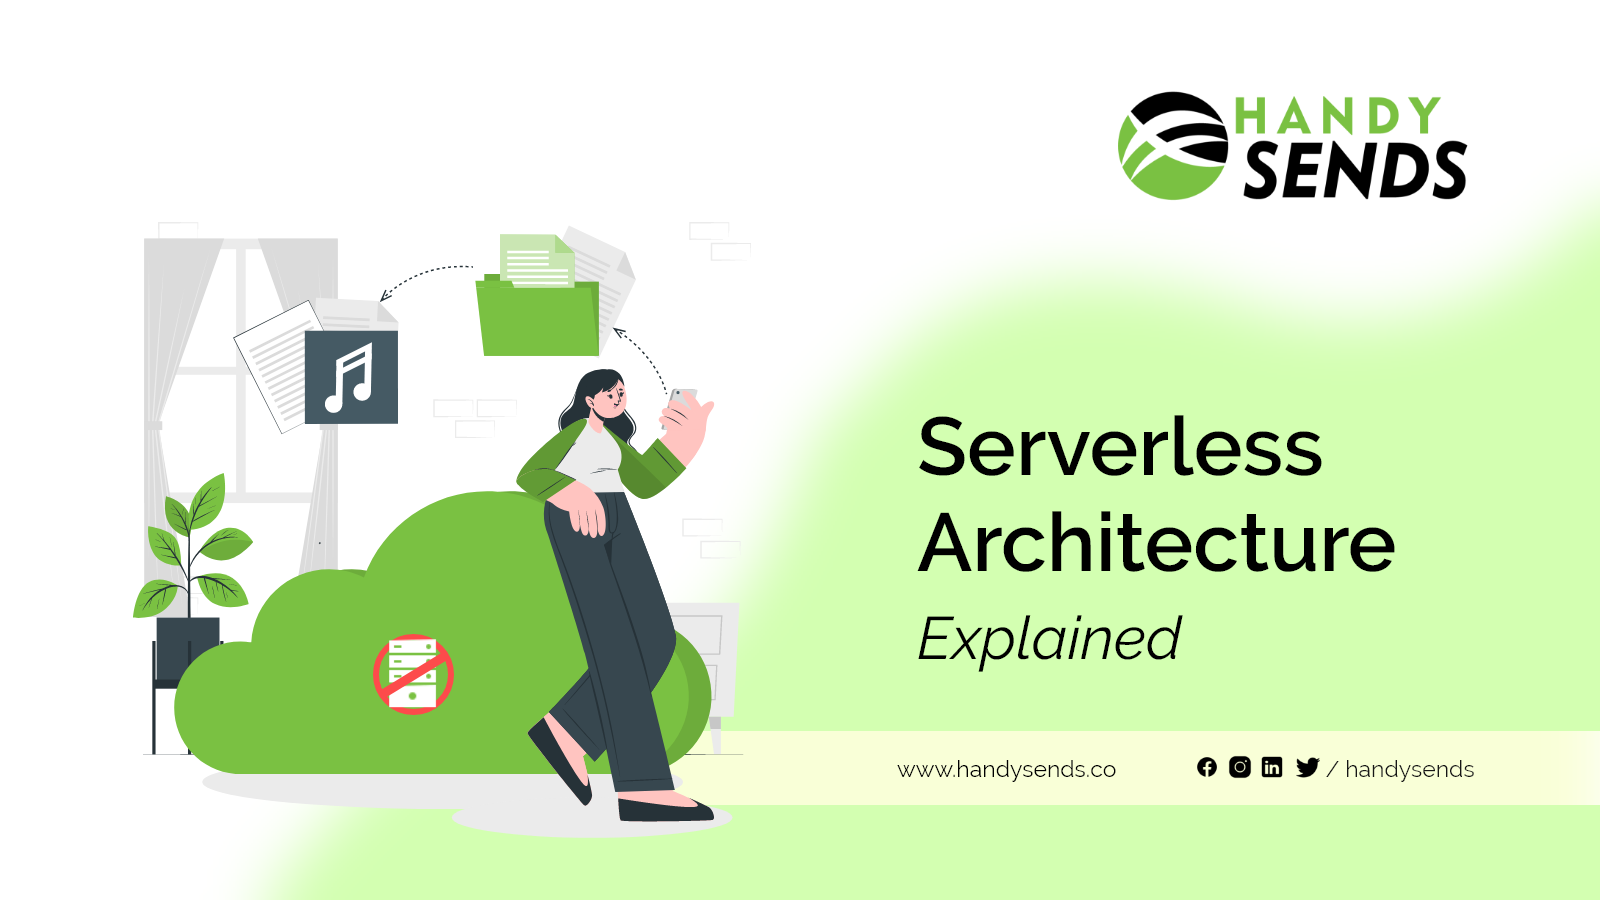 Serverless Architecture Explained